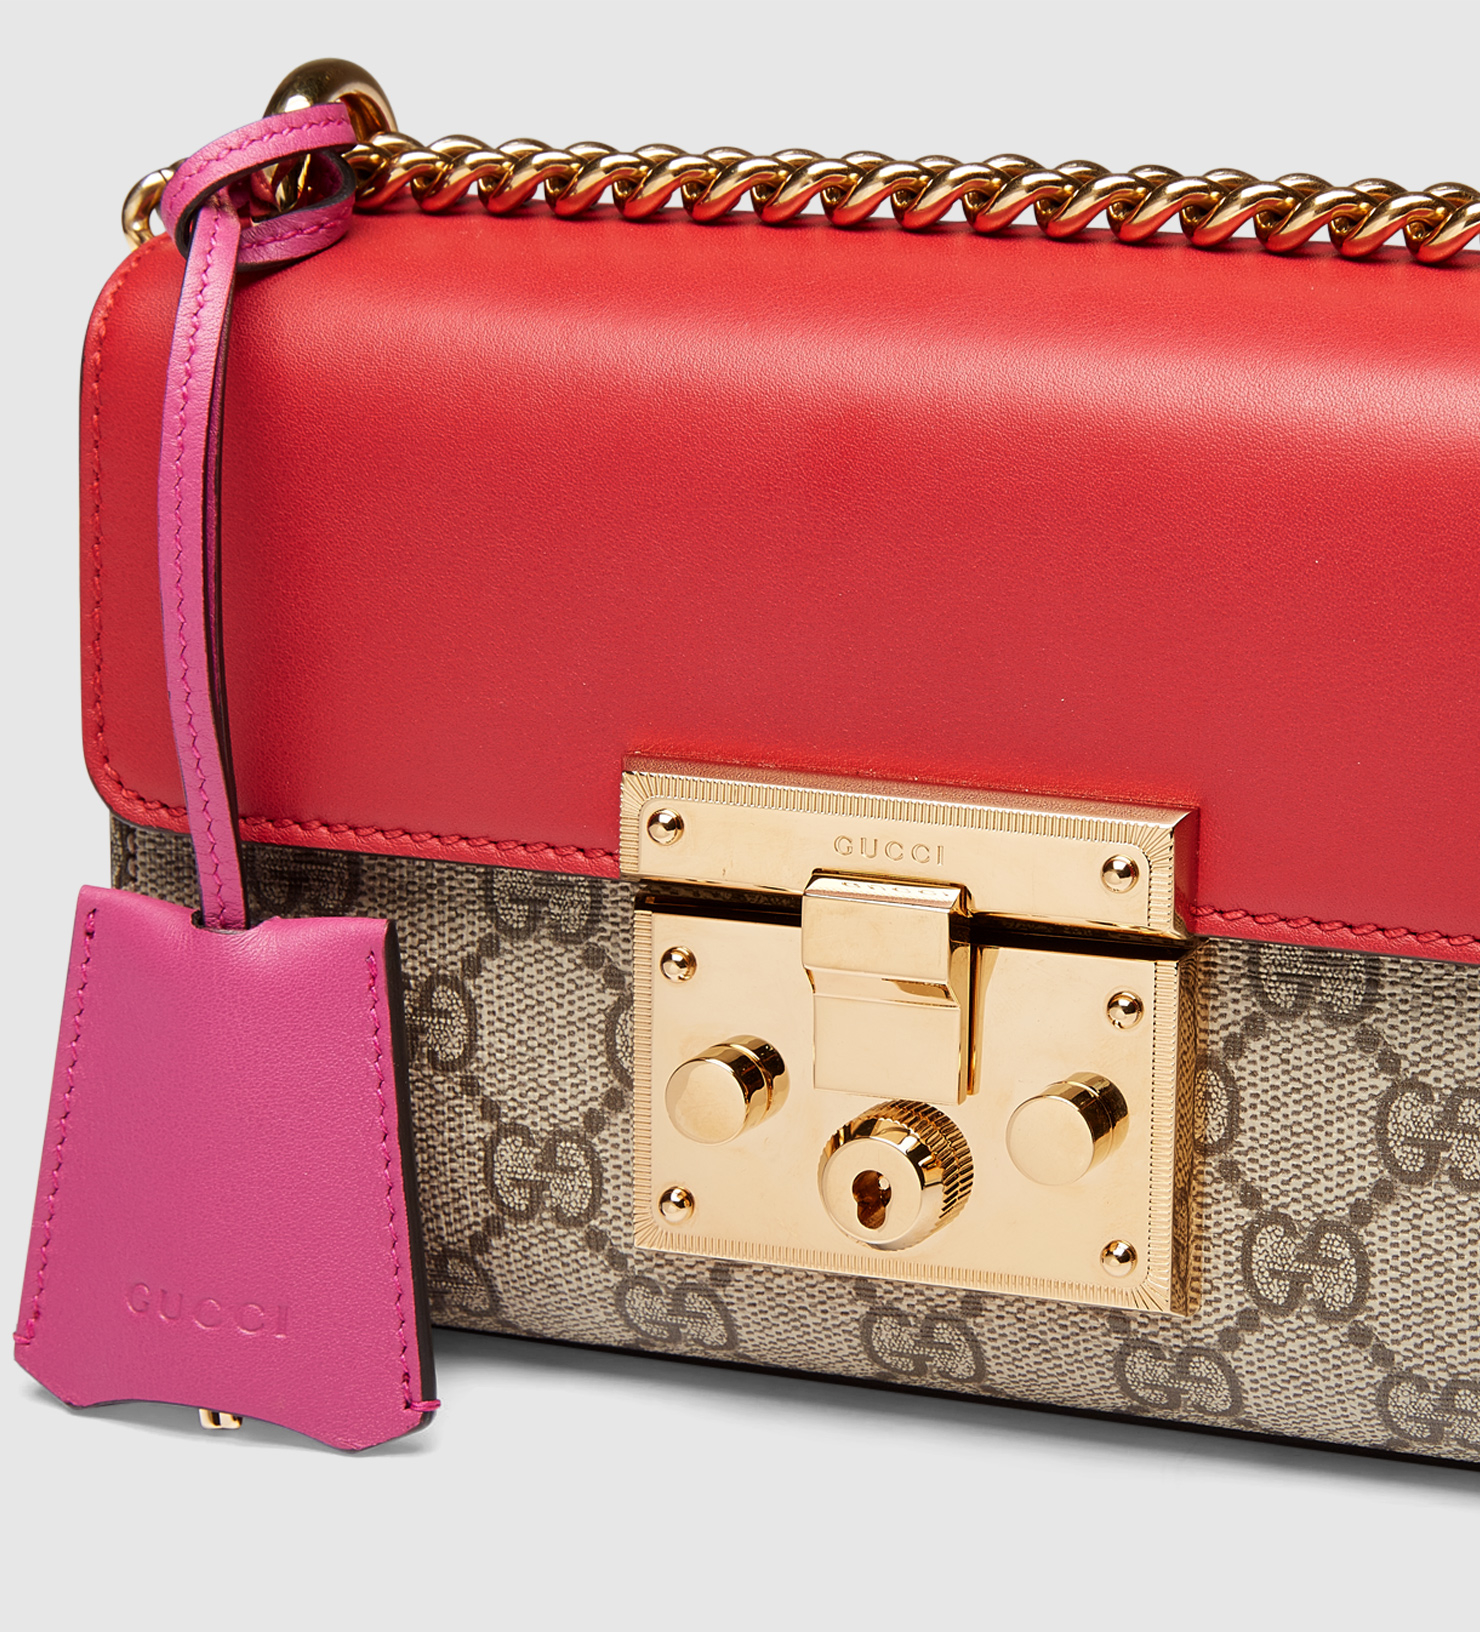 f21b59a8f76 Lyst - Gucci Padlock Gg Supreme Shoulder Bag